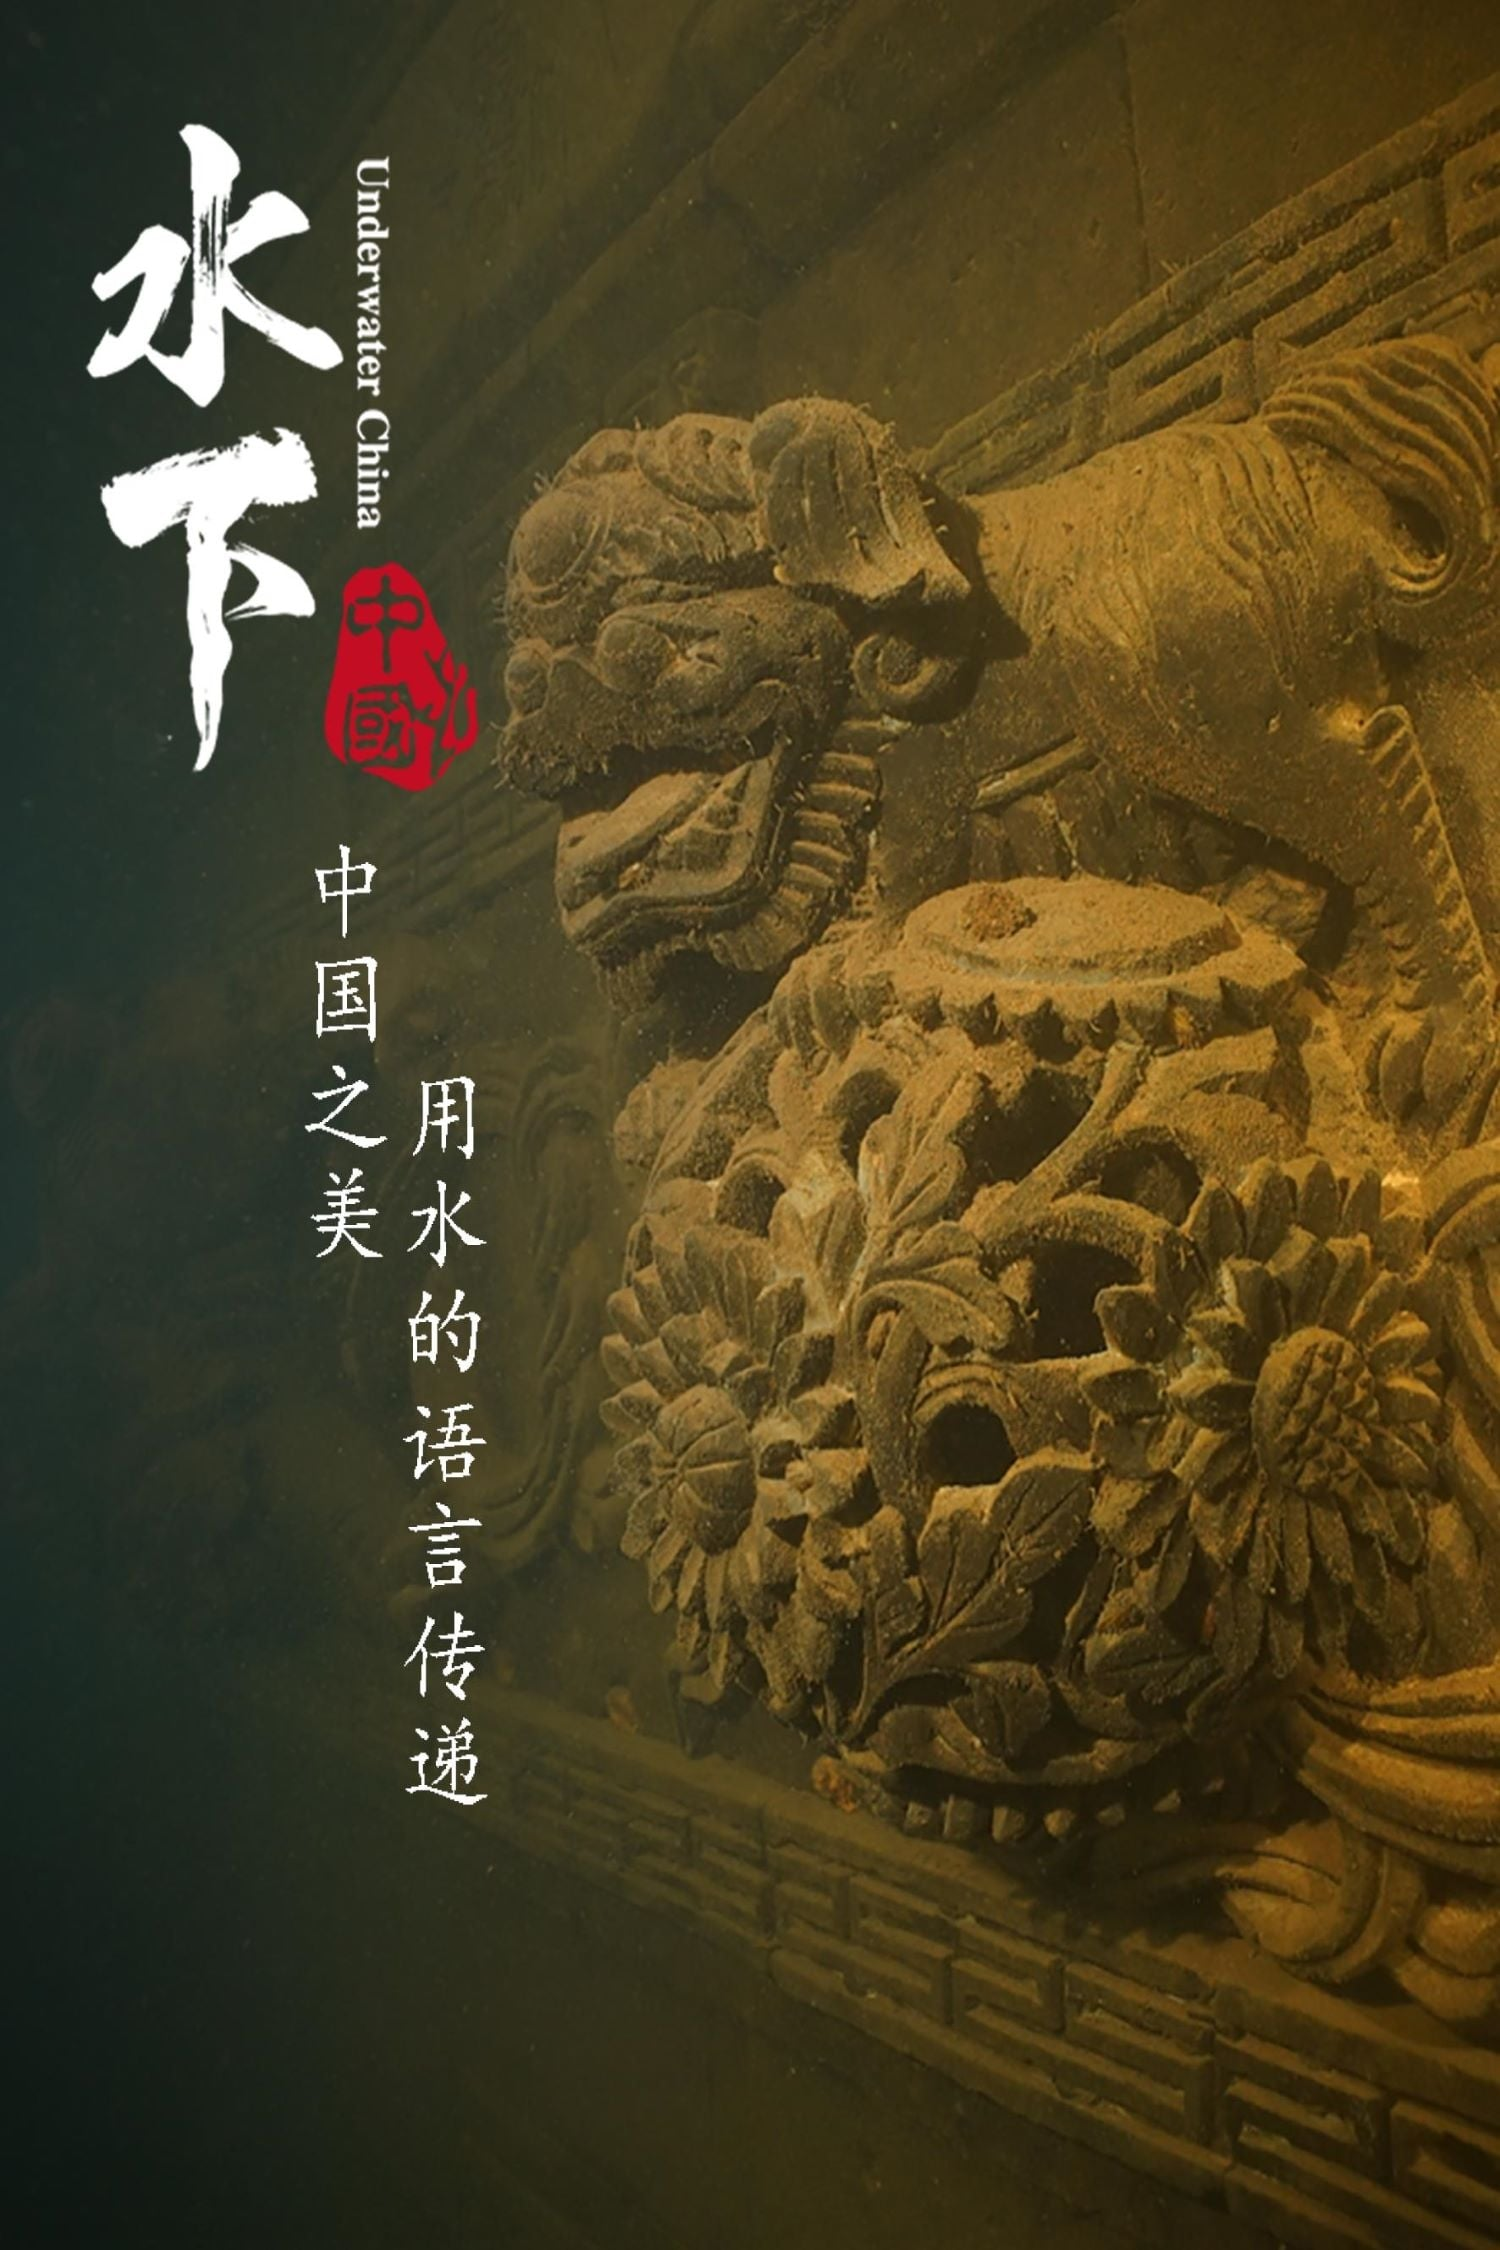 水下中国 Underwater China (2019)